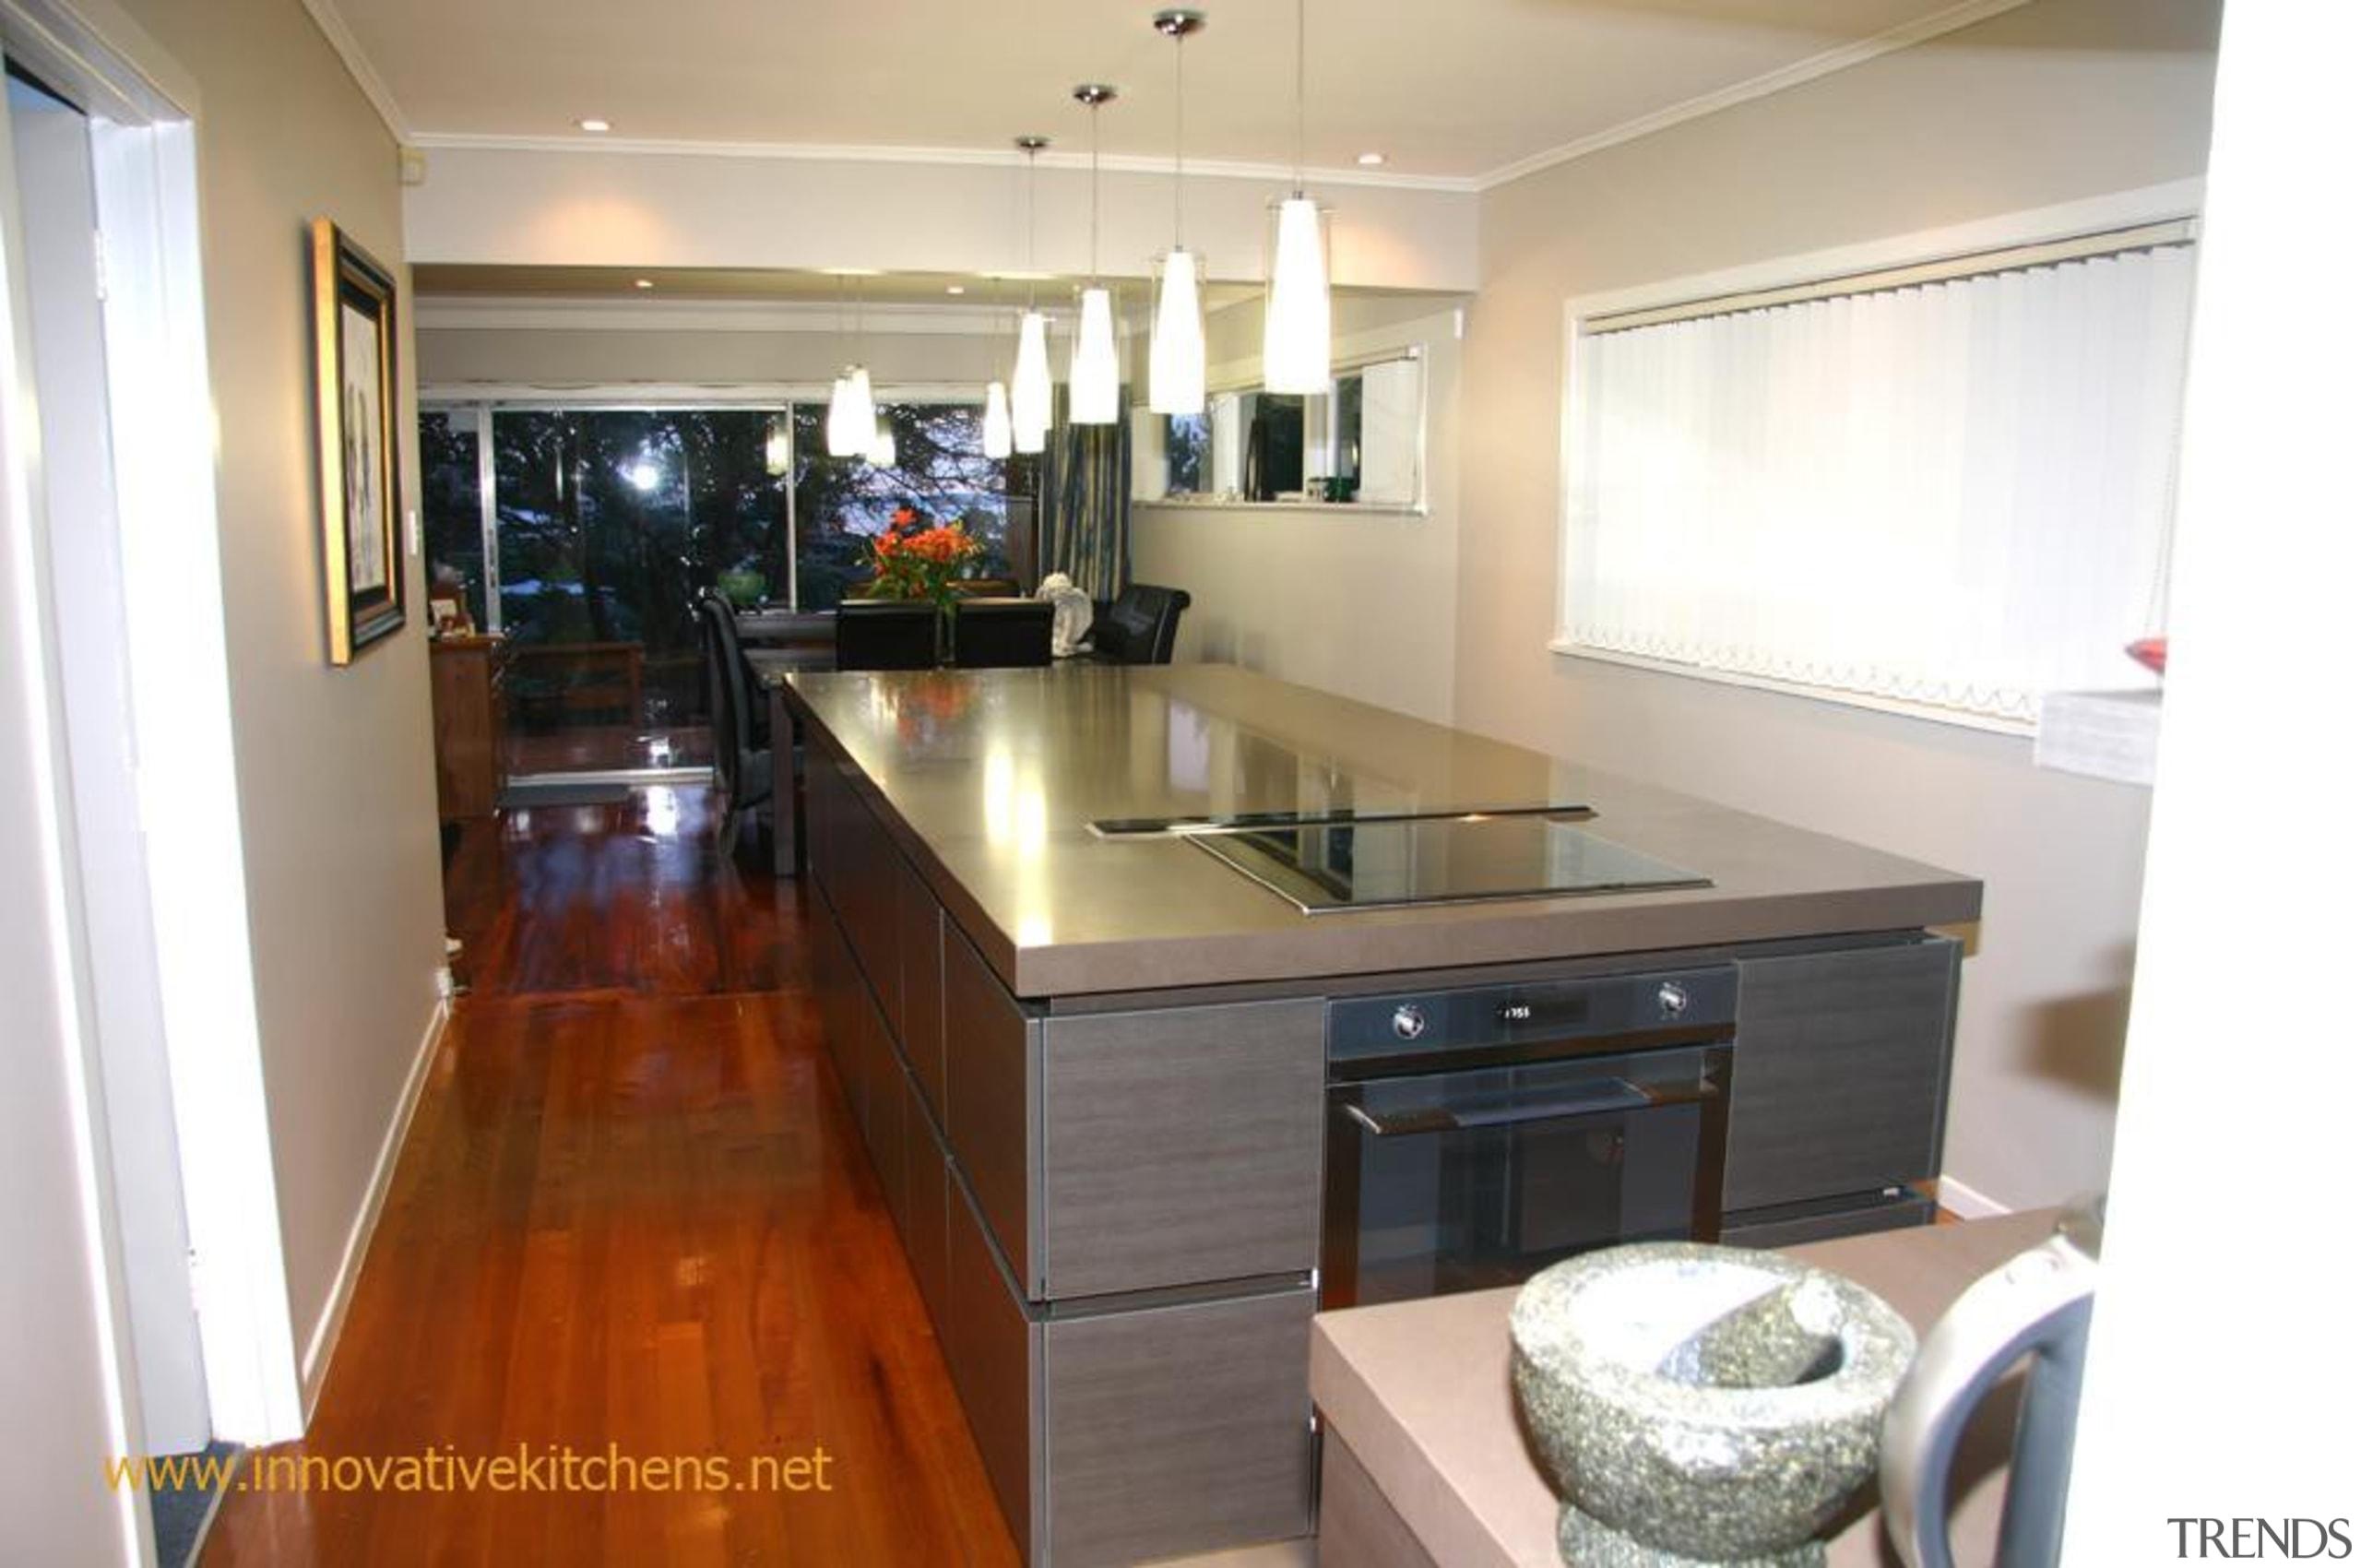 19 modern lynfield 2012 6.jpg - 19_modern_lynfield_2012_6.jpg - countertop, cuisine classique, interior design, kitchen, property, real estate, room, white